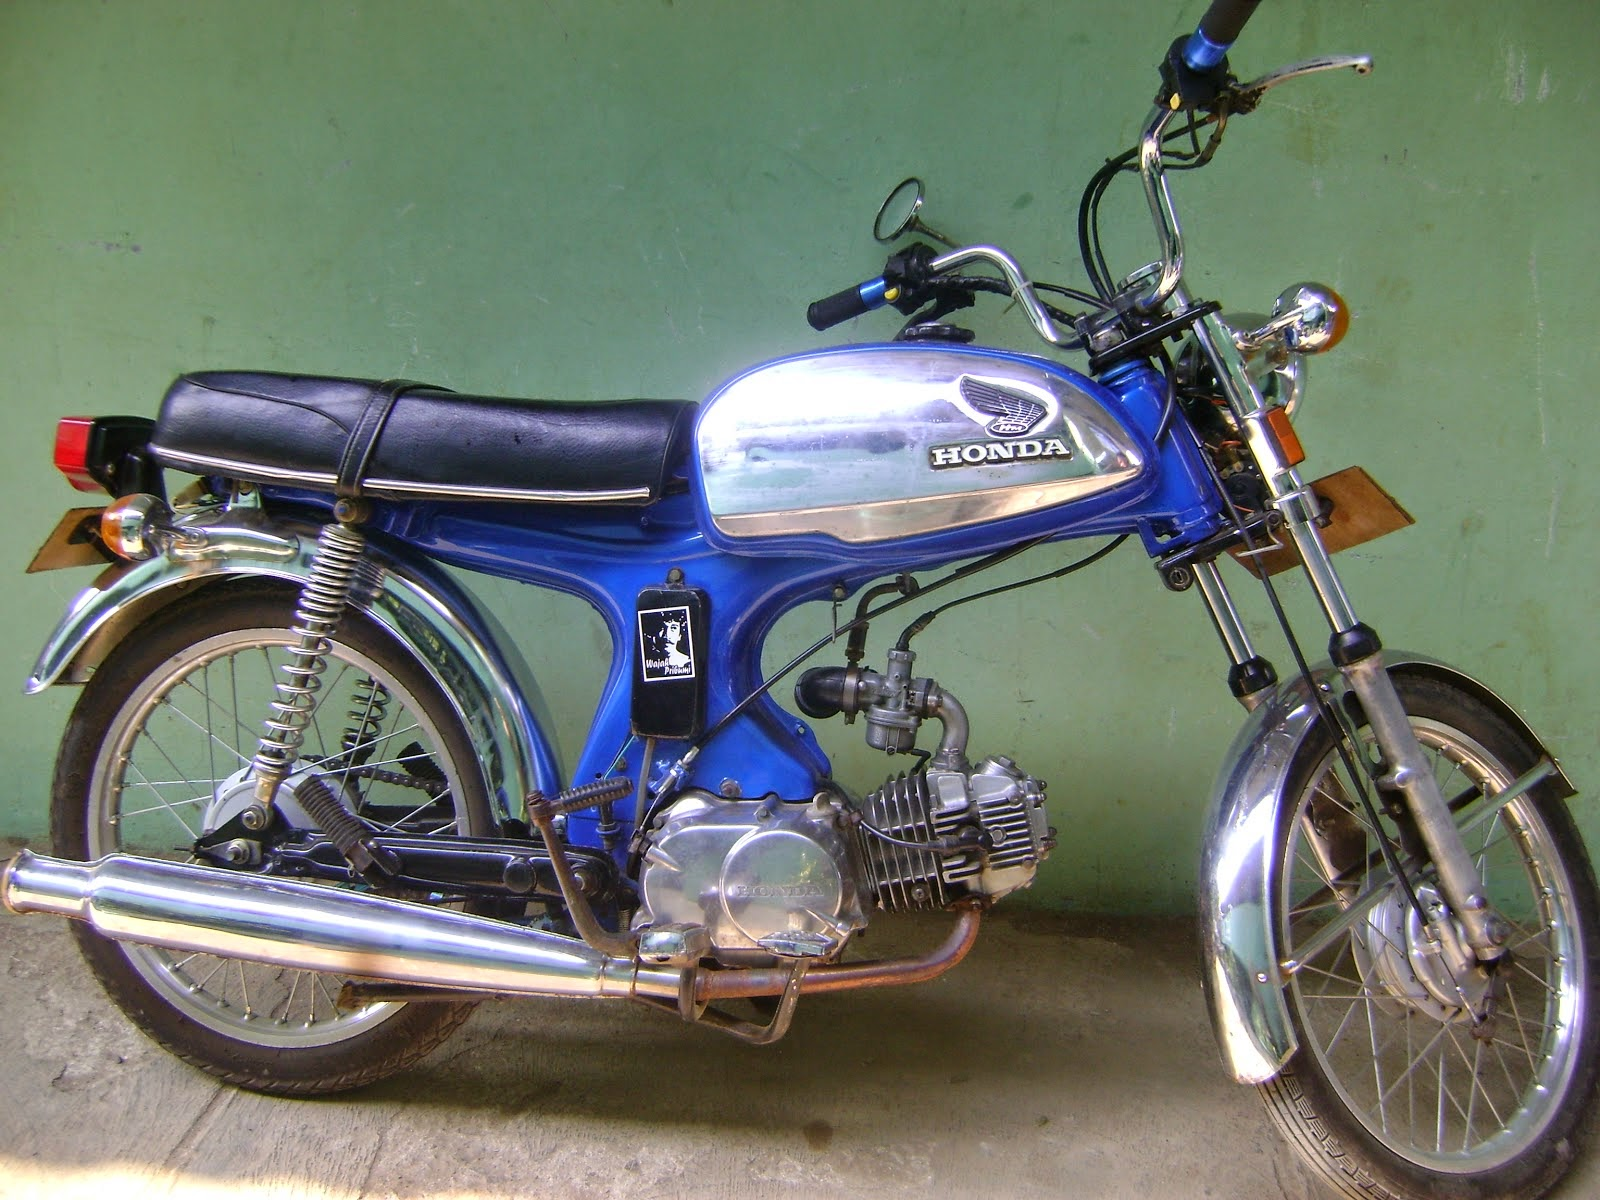 Koleksi Gambar Motor Antik Terlengkap Oneng Motomania